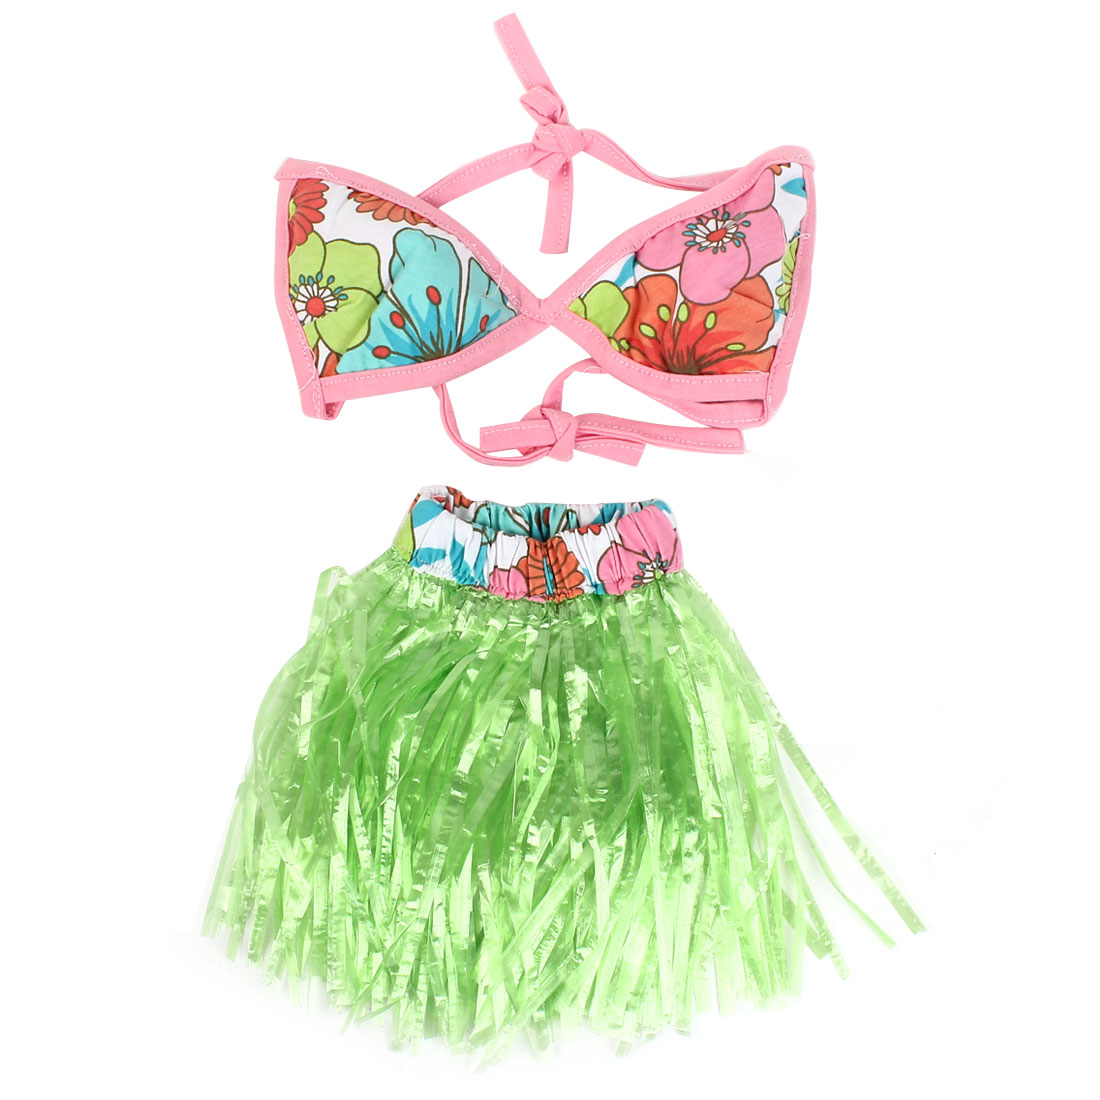 Green Pink Self Tie Pet Dog Puppy Bikini Summer Cool Swim Suit Apparel Skirt Dress Size M